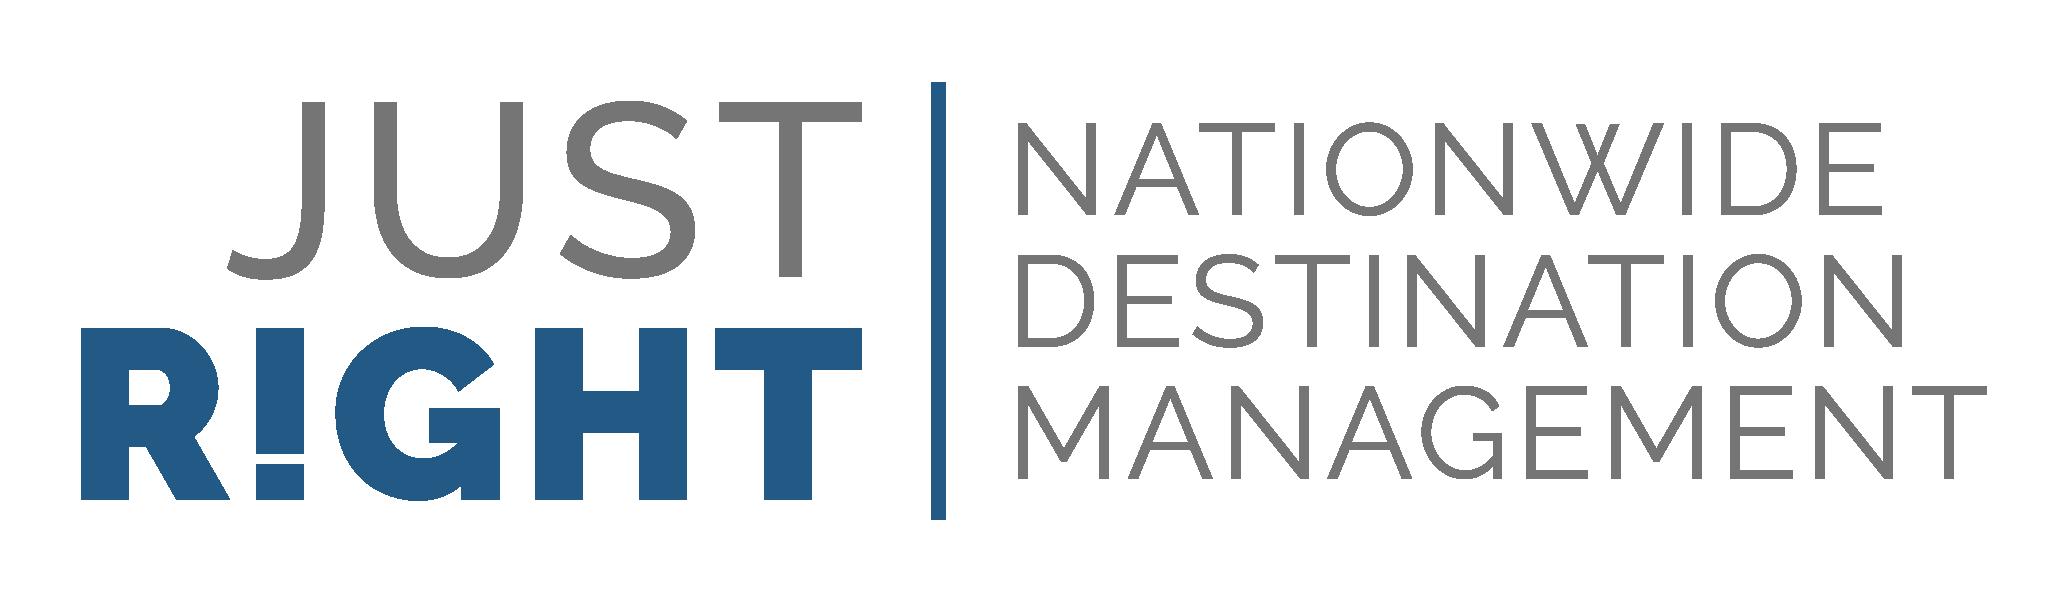 Just Right! Destination Management Logo